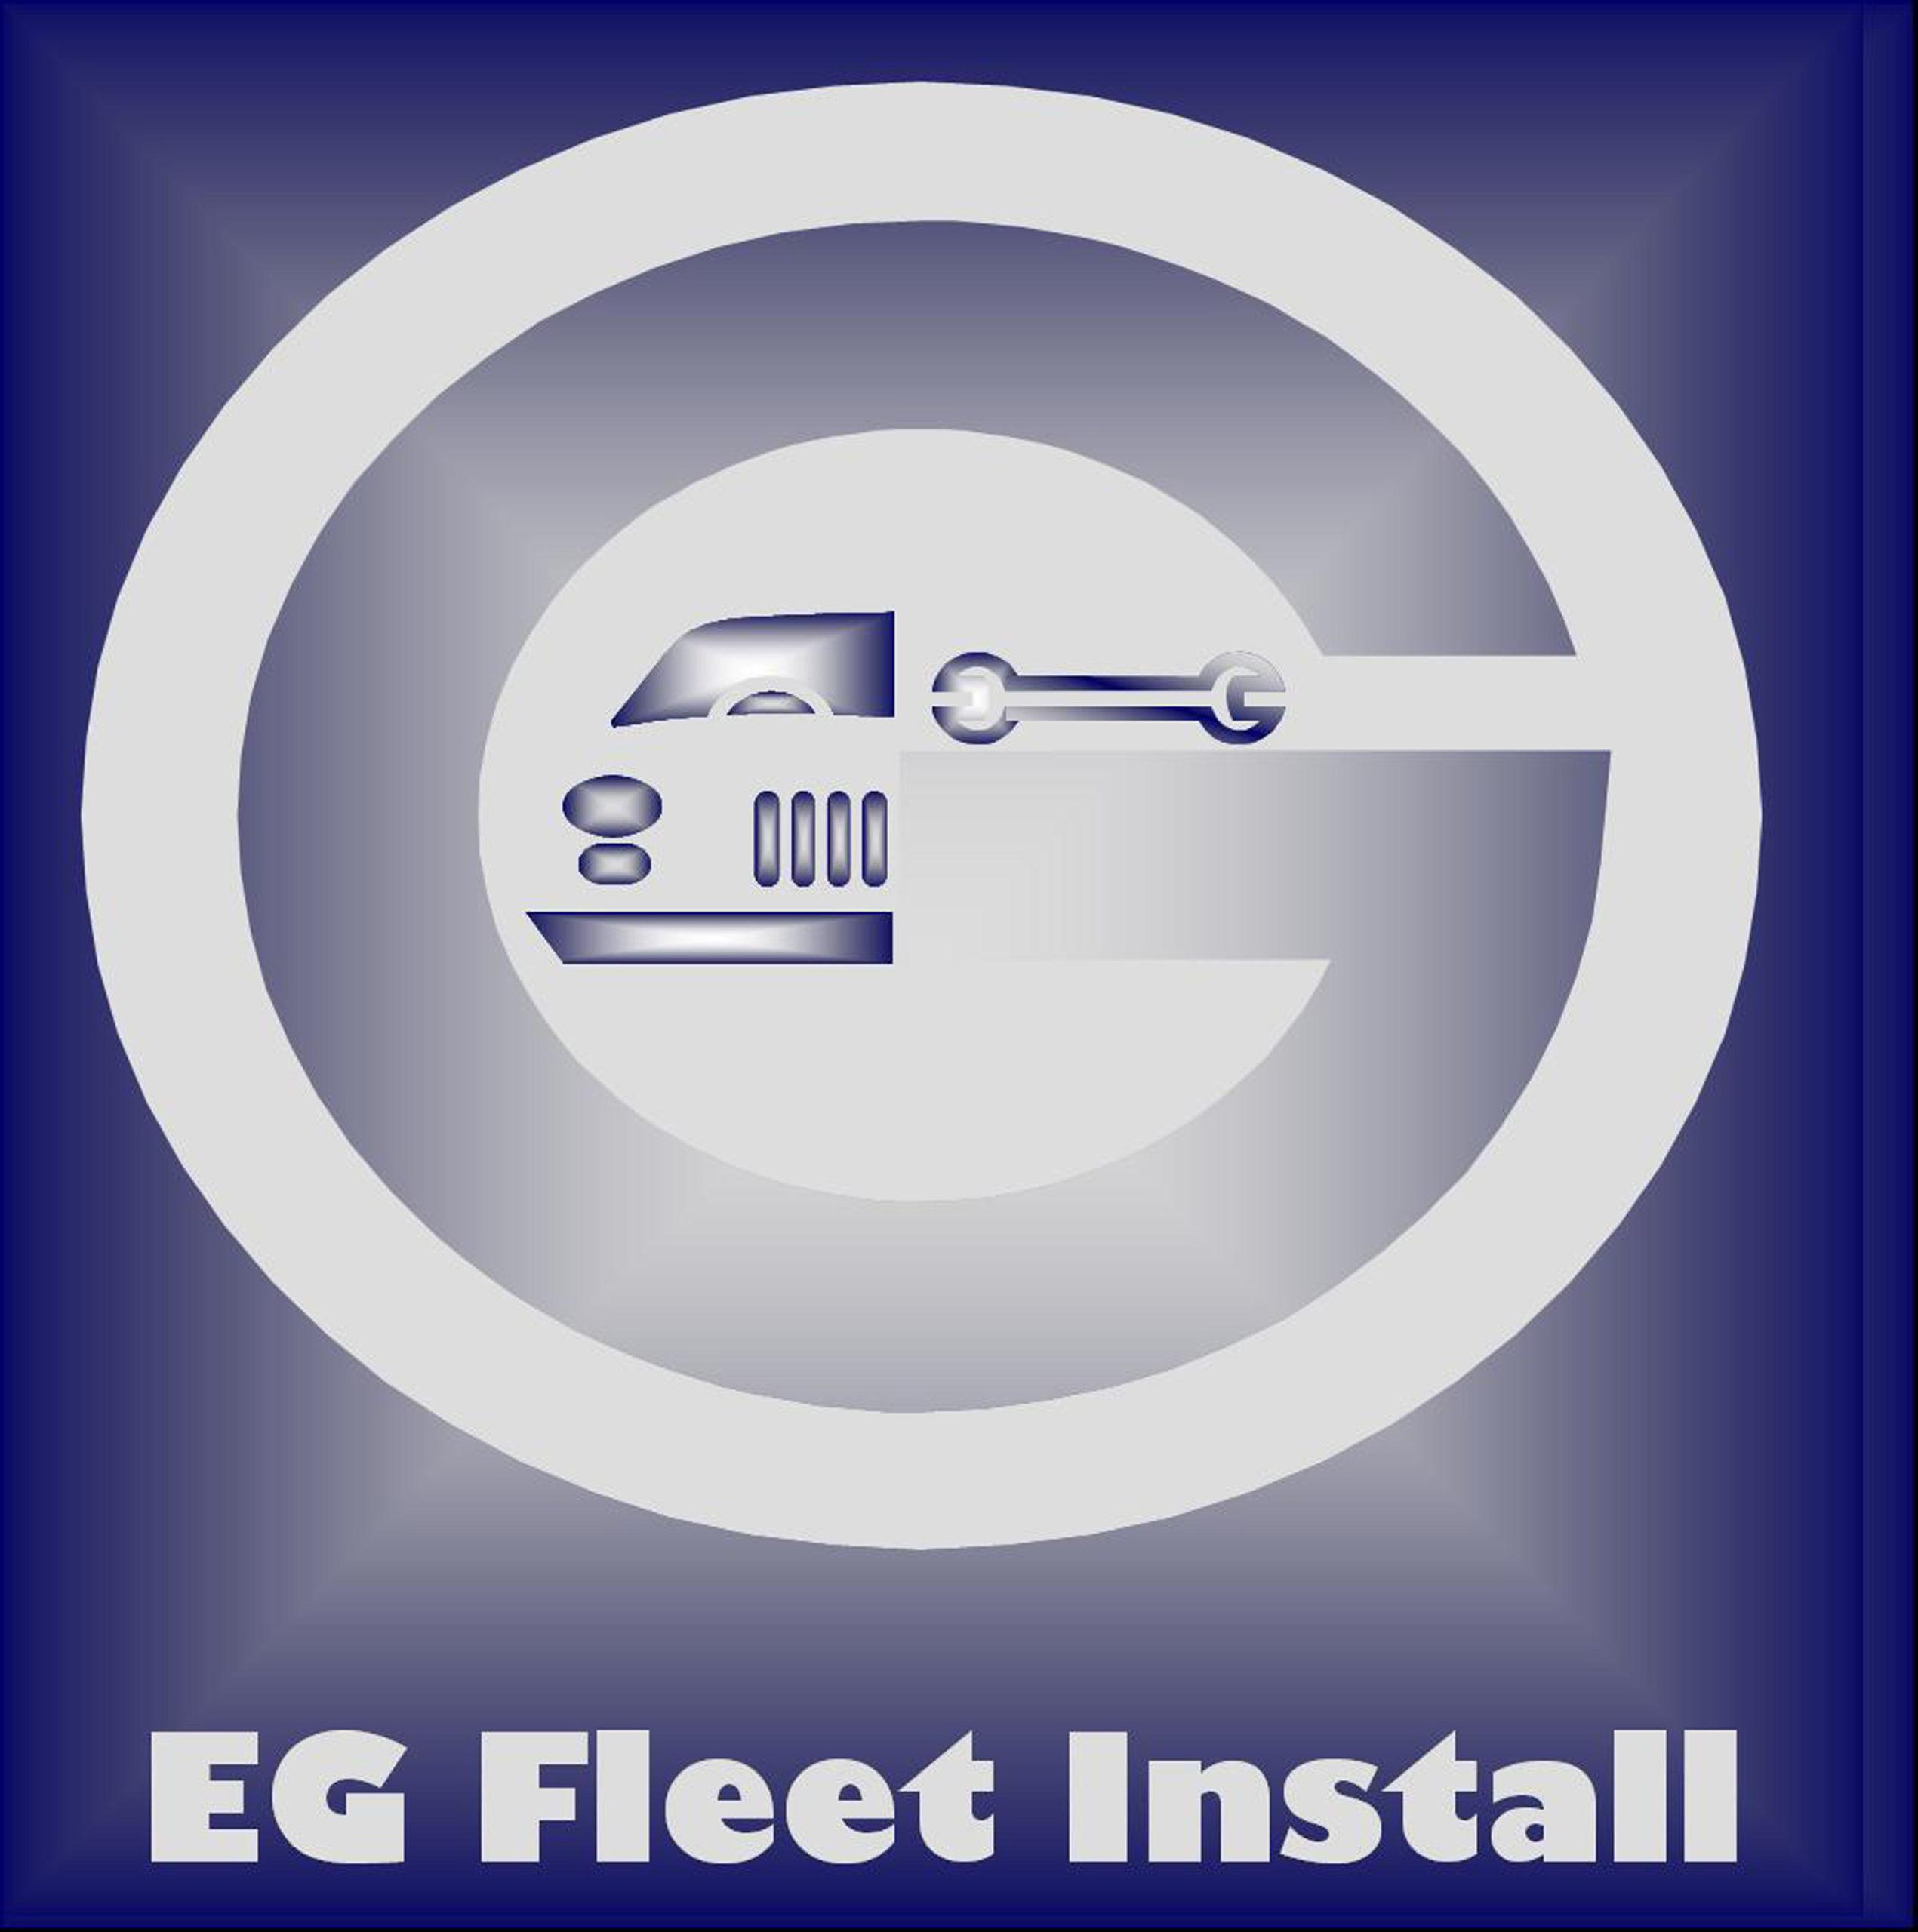 EG Fleet Install